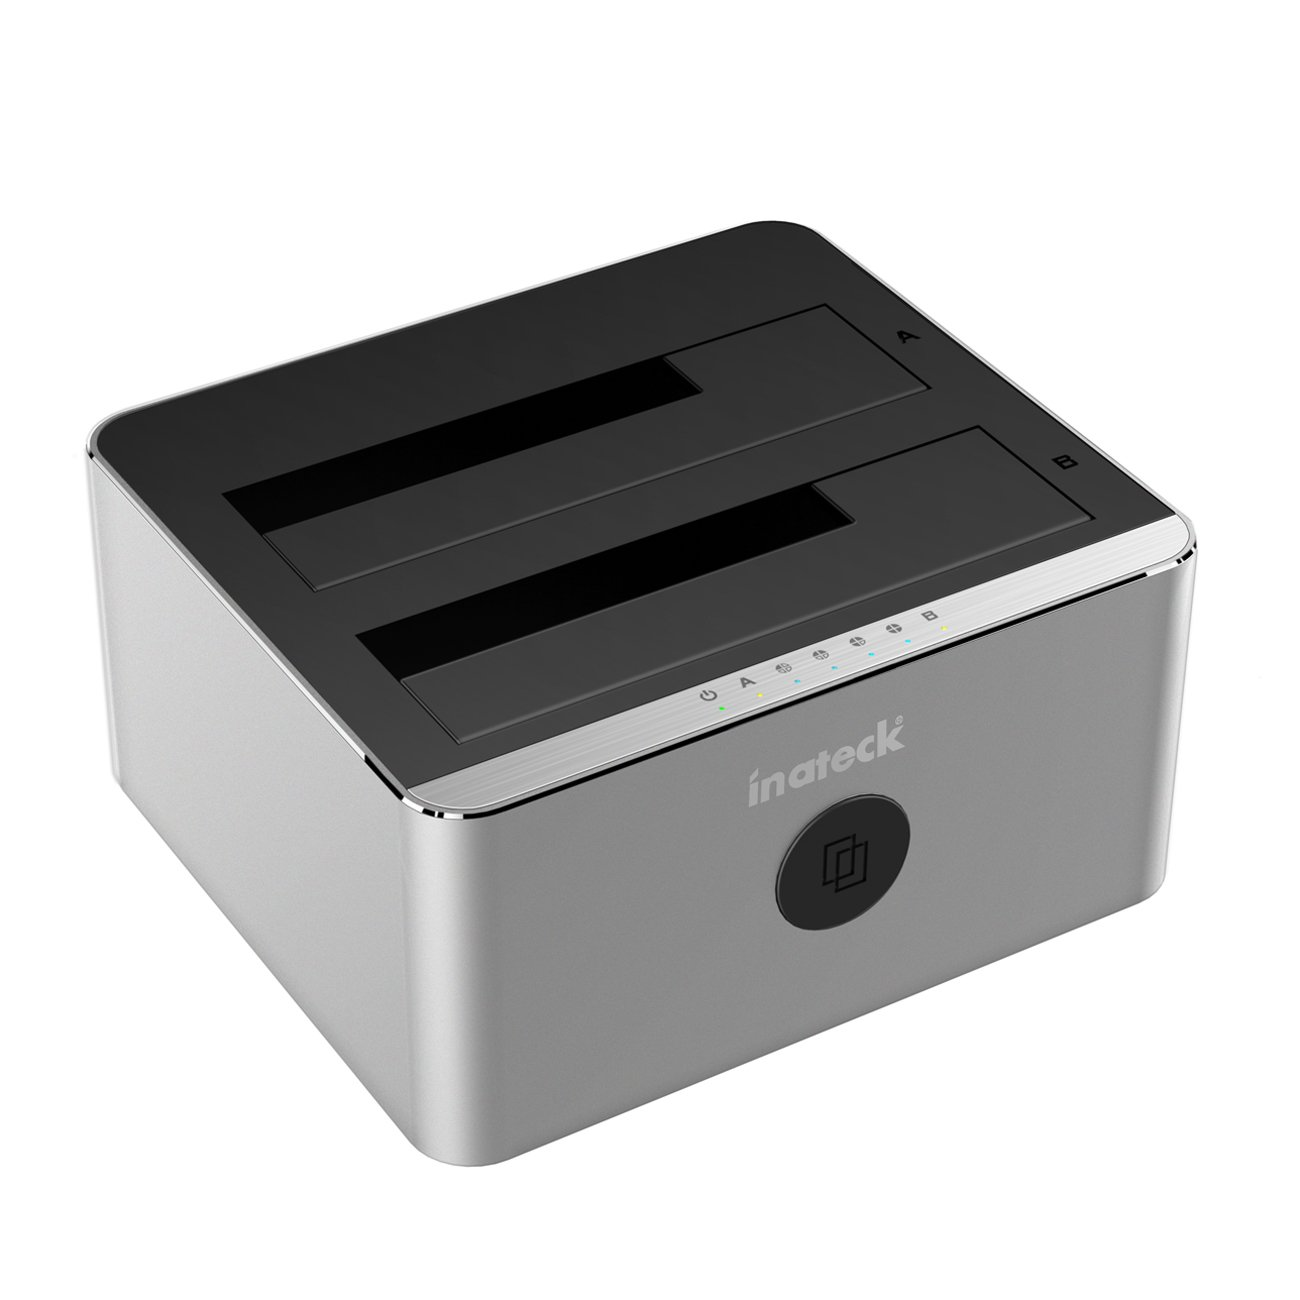 Inateck FD 2102 Hard Drive Docking Station USB 3.0 a SATA Dual-Bay USB 3.0 con funzione clone Offline per HDD SSD SATA (SATA I/II/III) da 2.5 e 3.5 pollici. Supporta 2 x 8TB e UASP tool- free FD2102